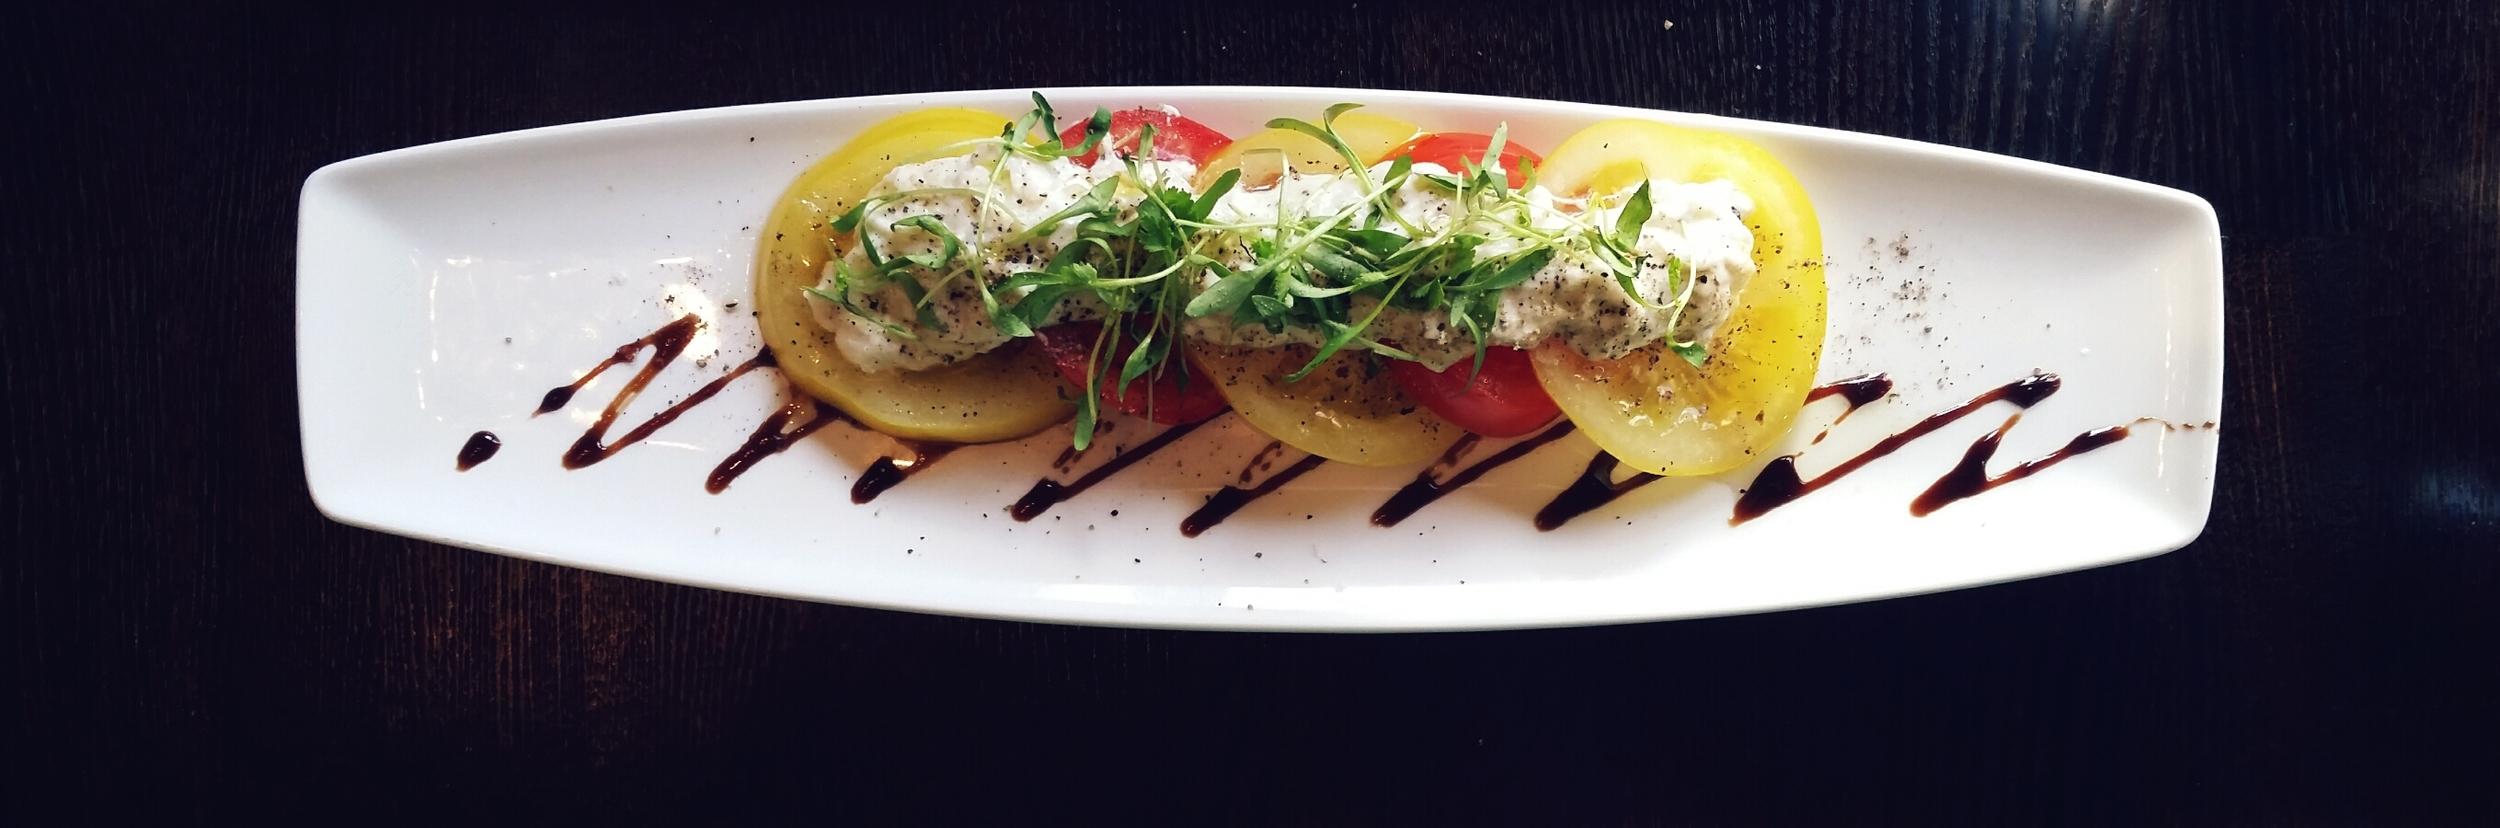 Burrata Salad tomato, balsamic reduction, imported Greek olive oil